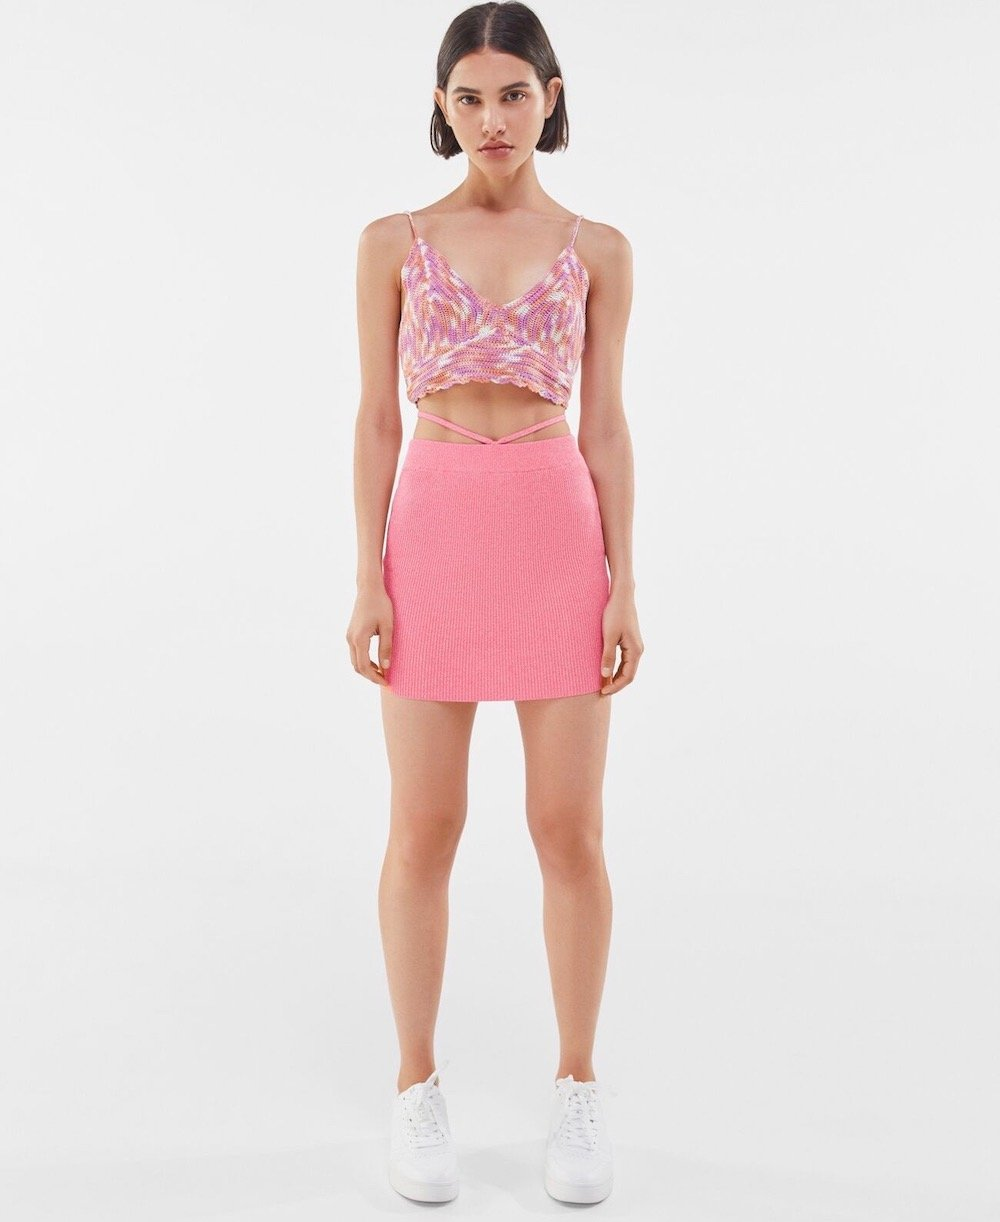 bershka mini skirt with straps on the waist